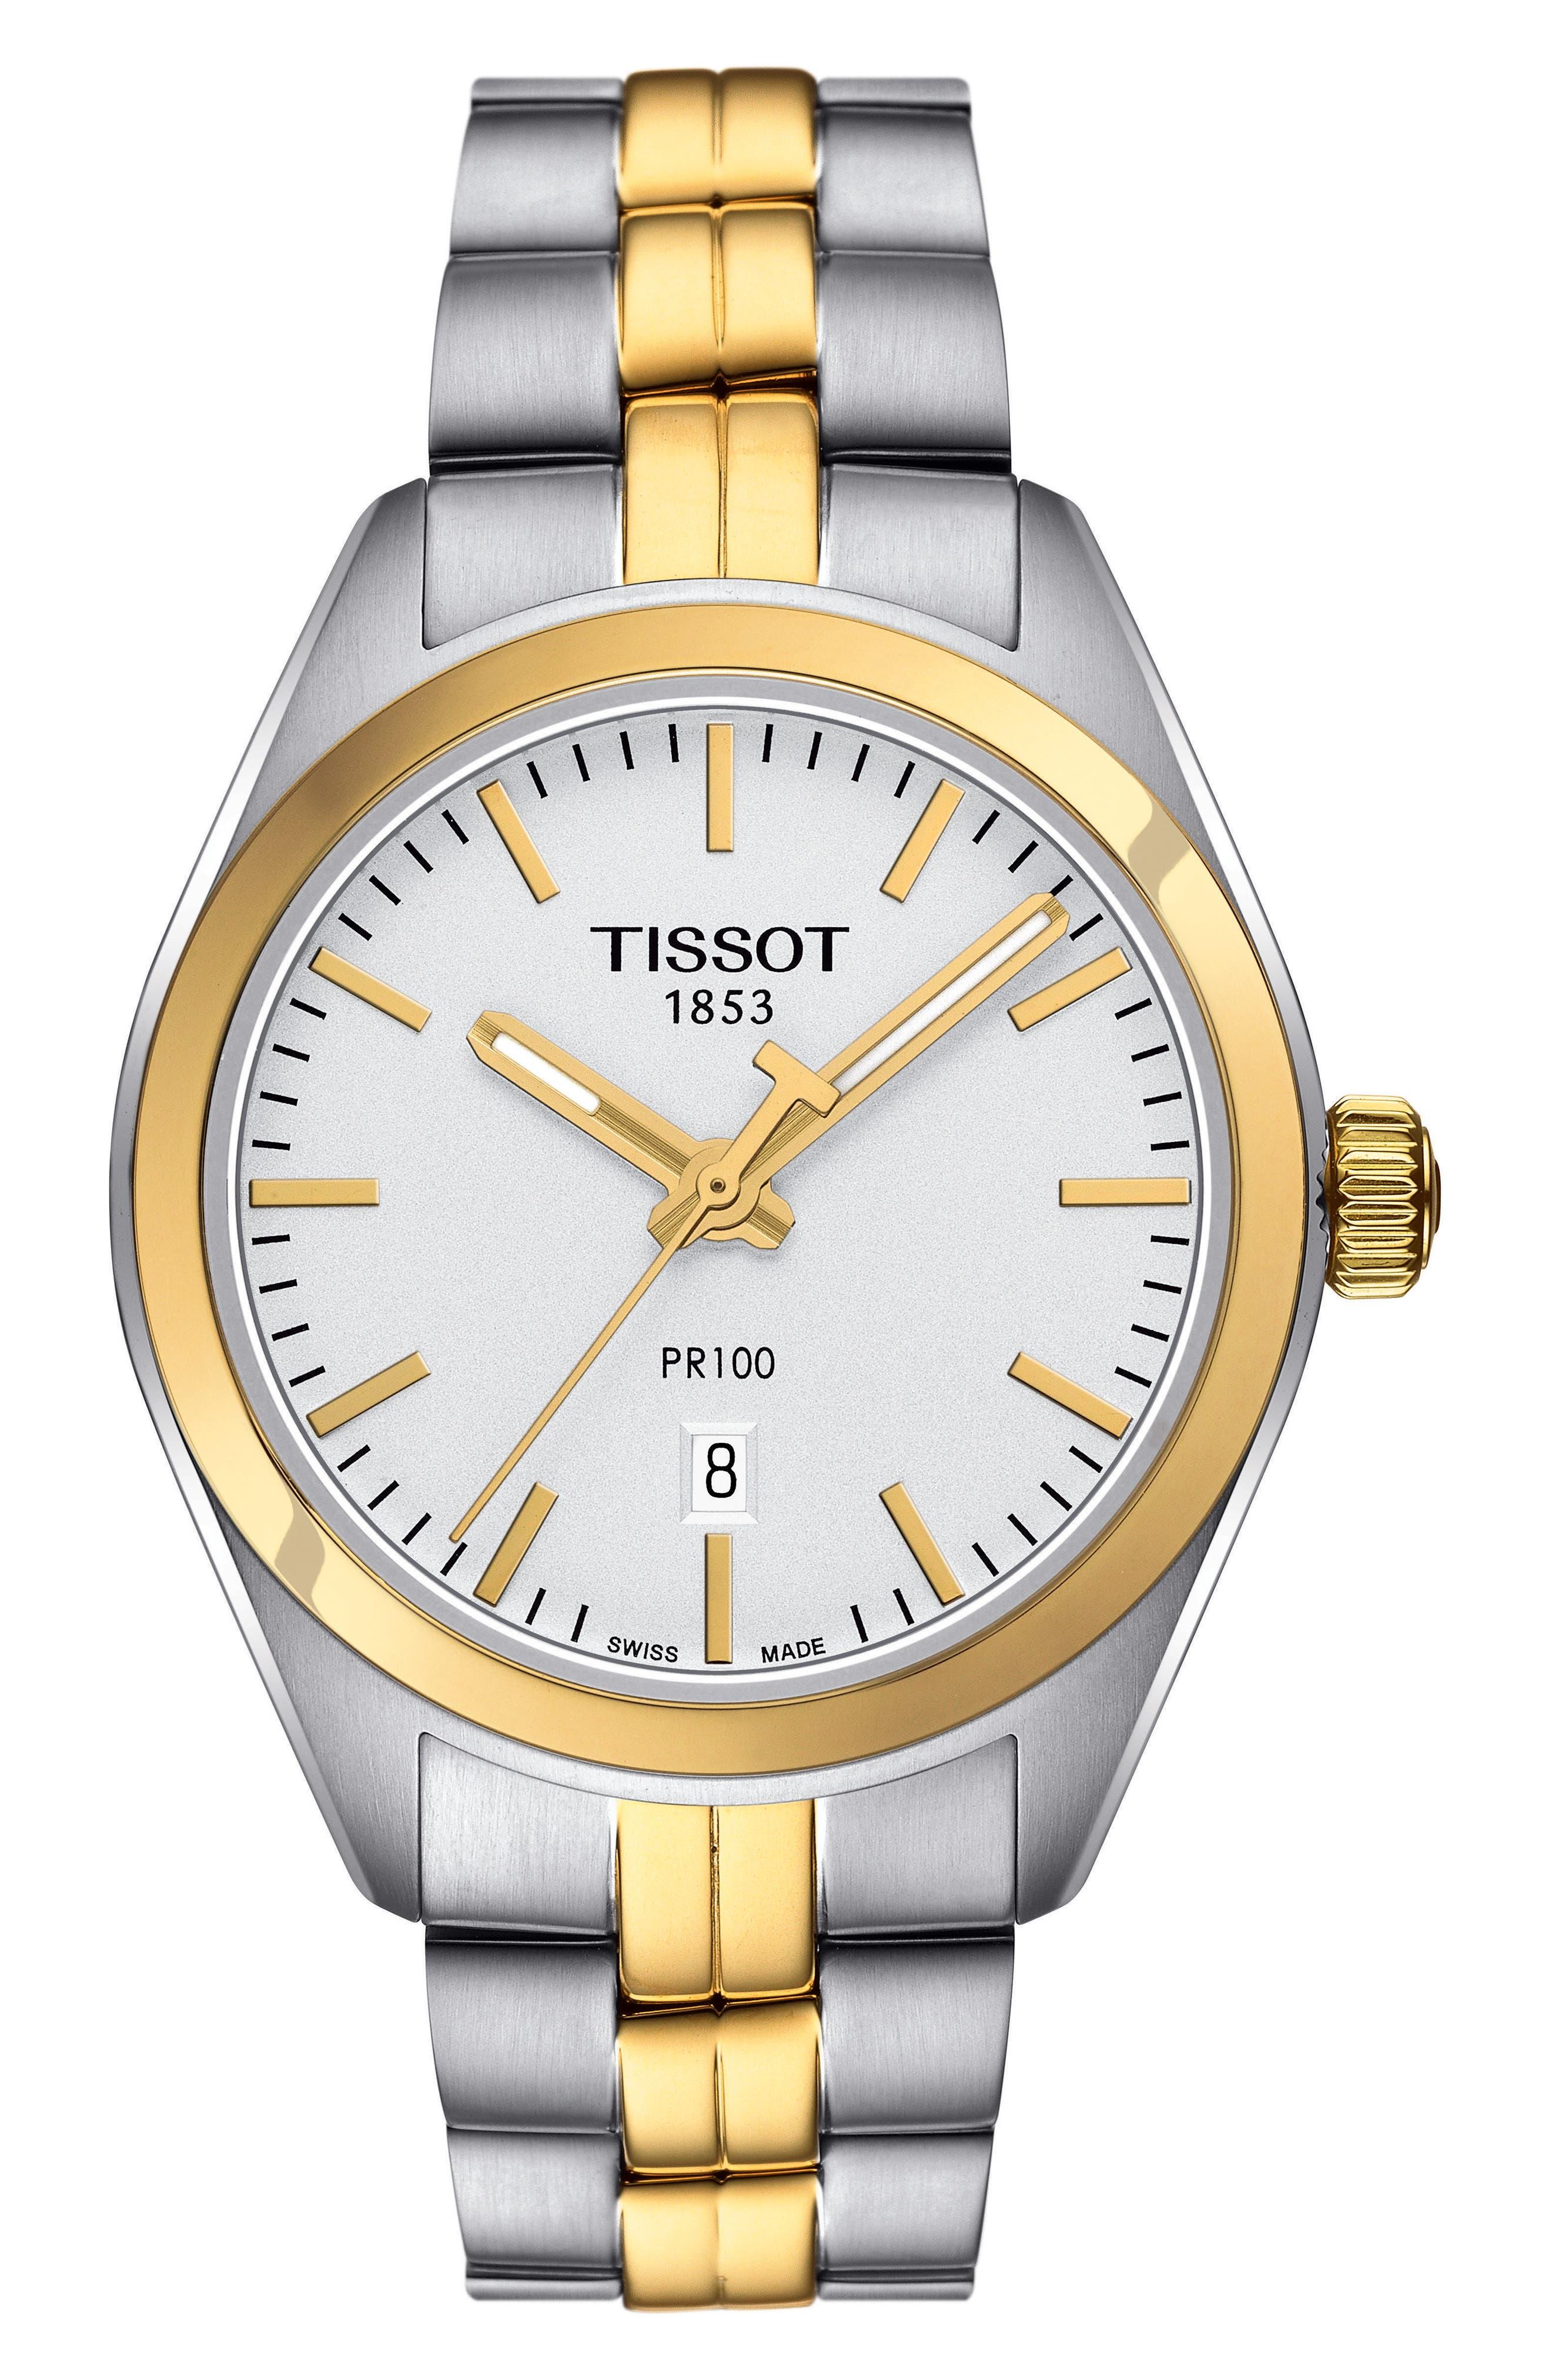 Main Image - Tissot PR100 Bracelet Watch, 33mm